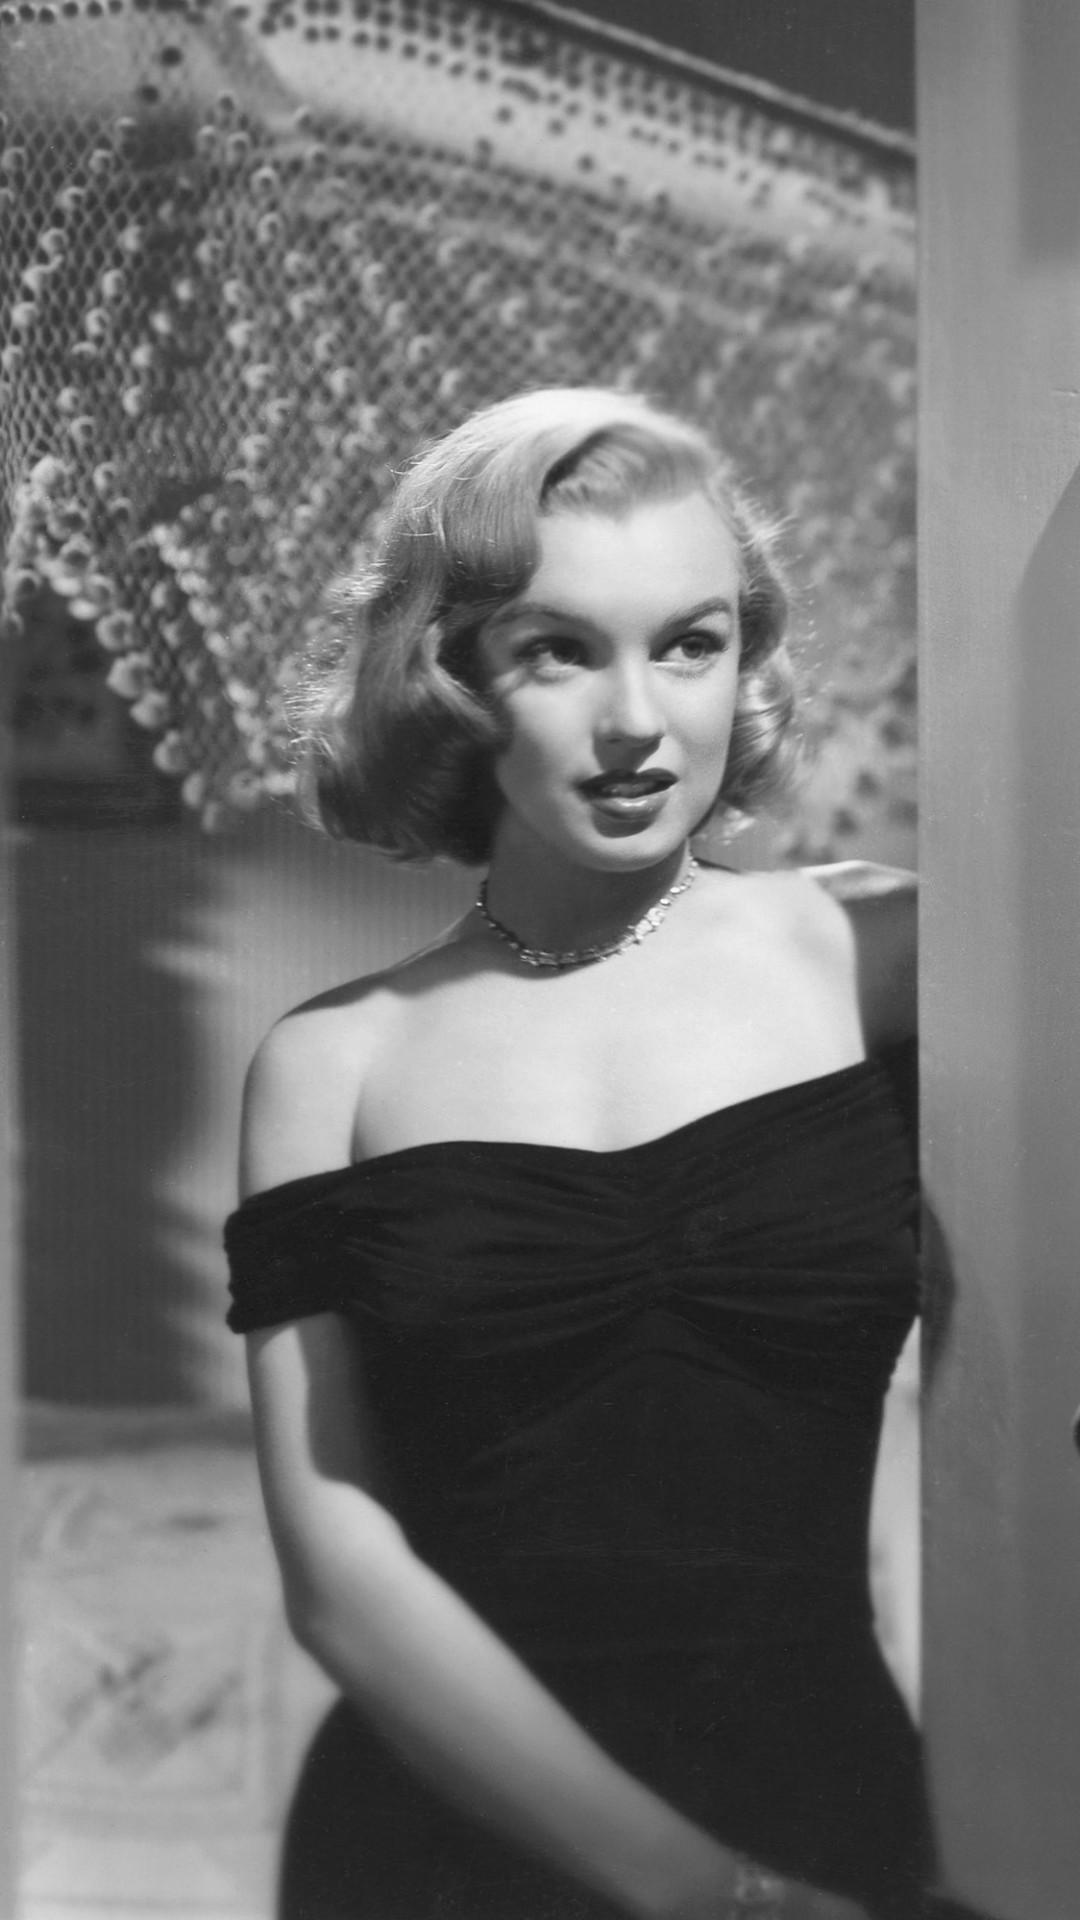 Marilyn Monroe Wallpaper 63 images 1080x1920